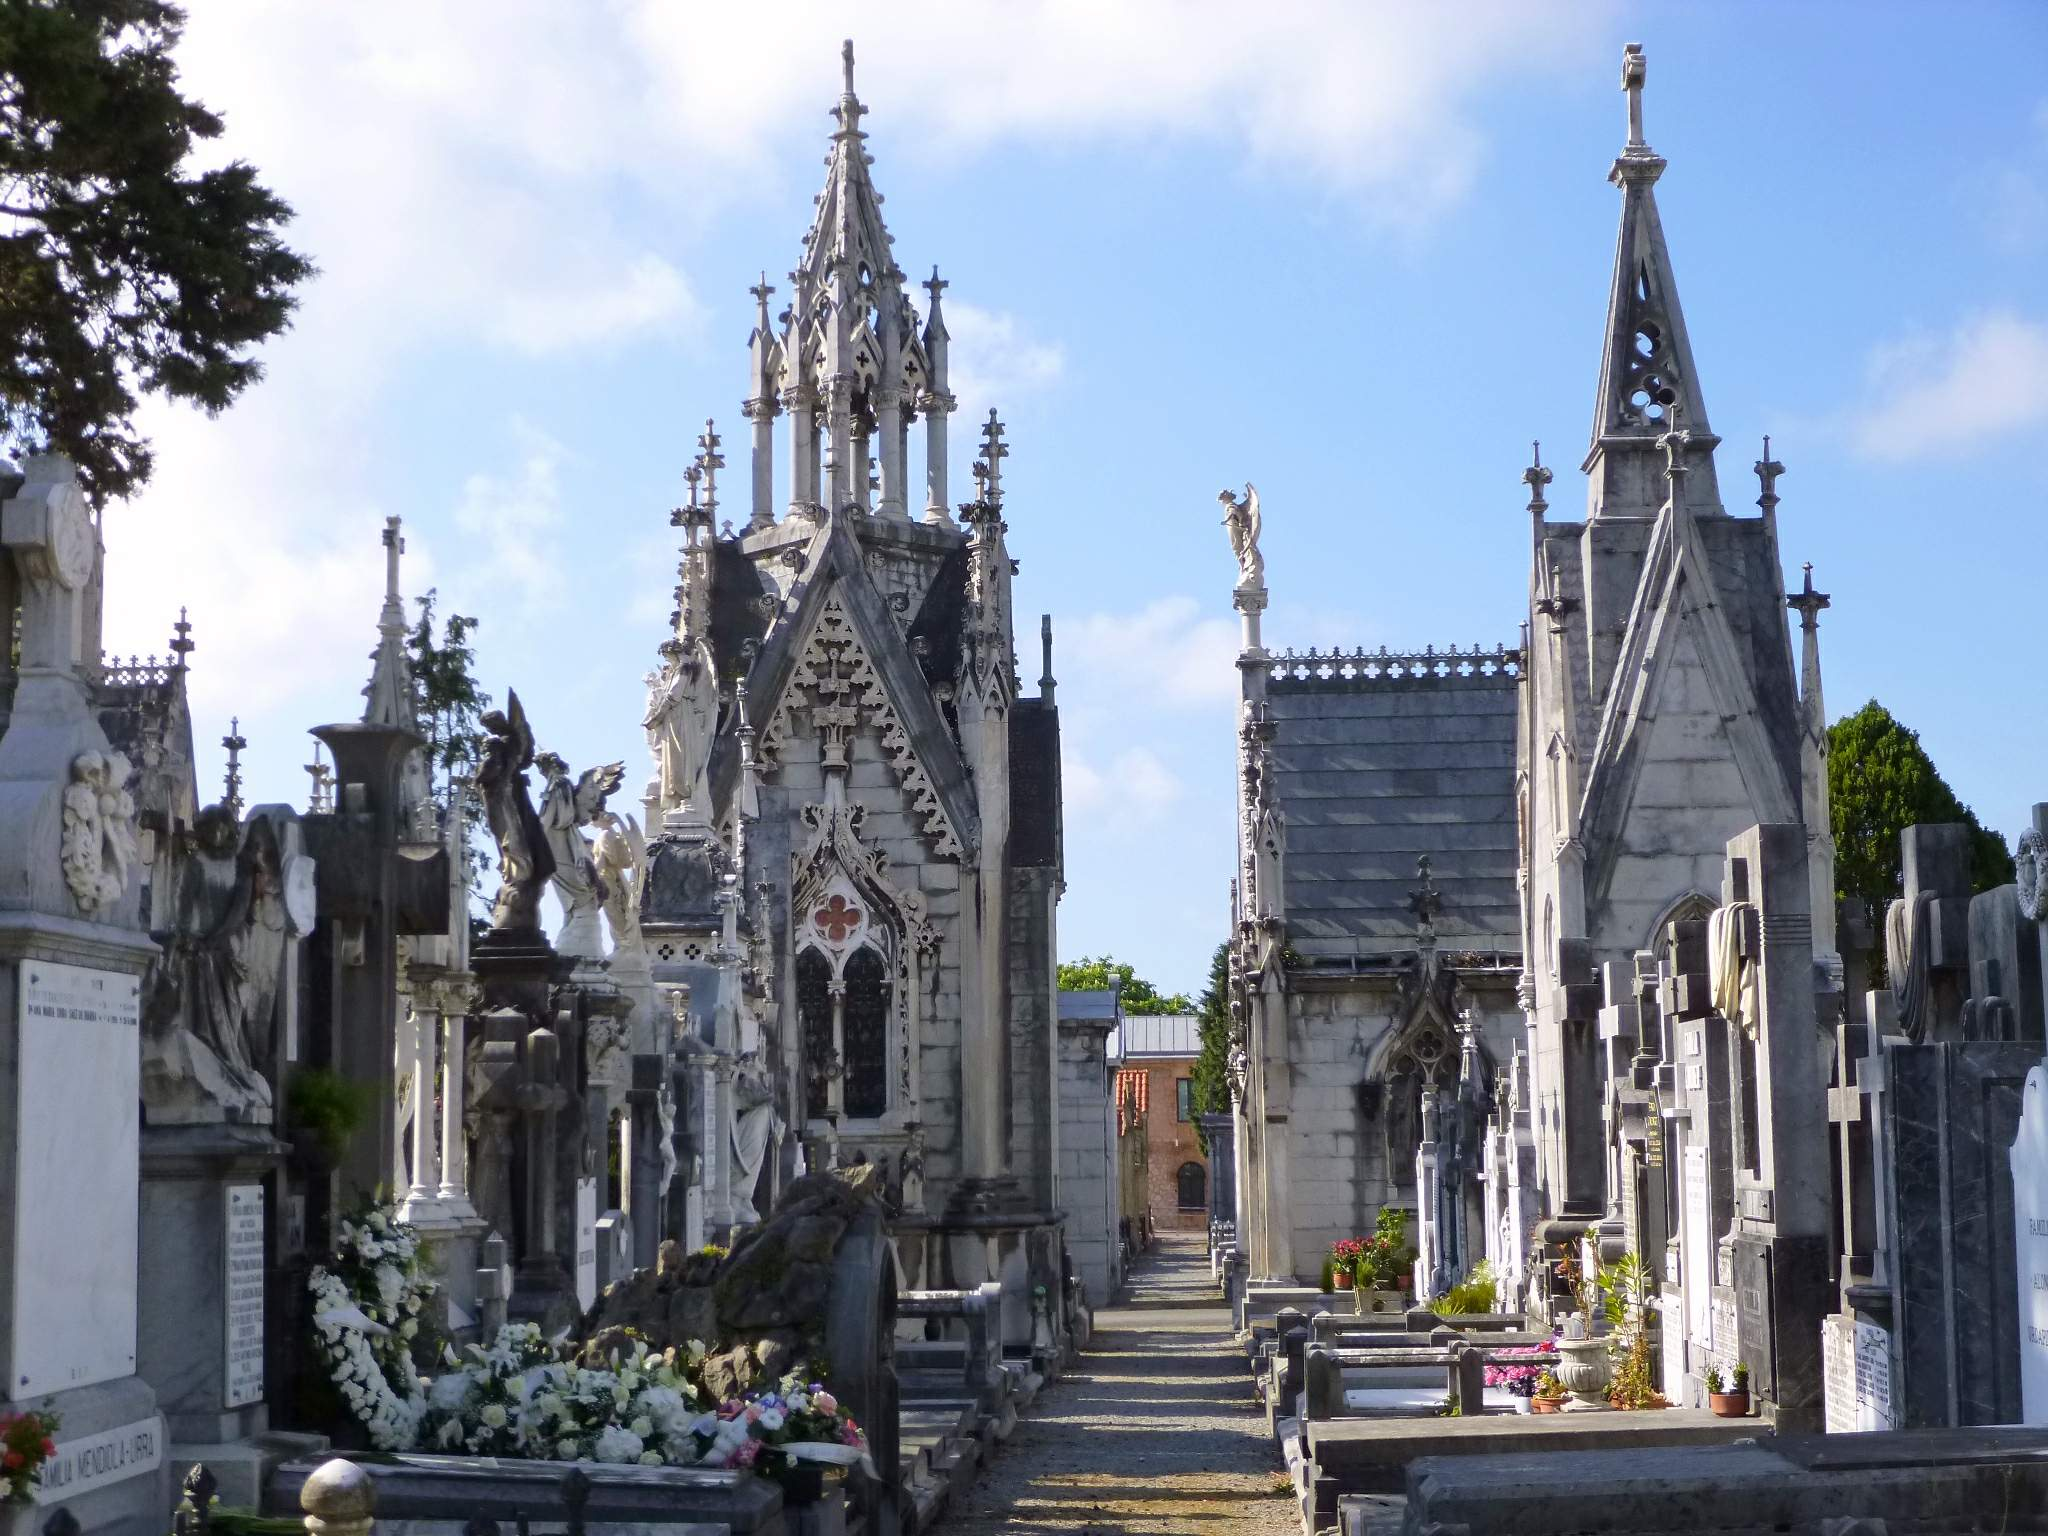 Polloe Cemetery (San Sebastian, Spain)